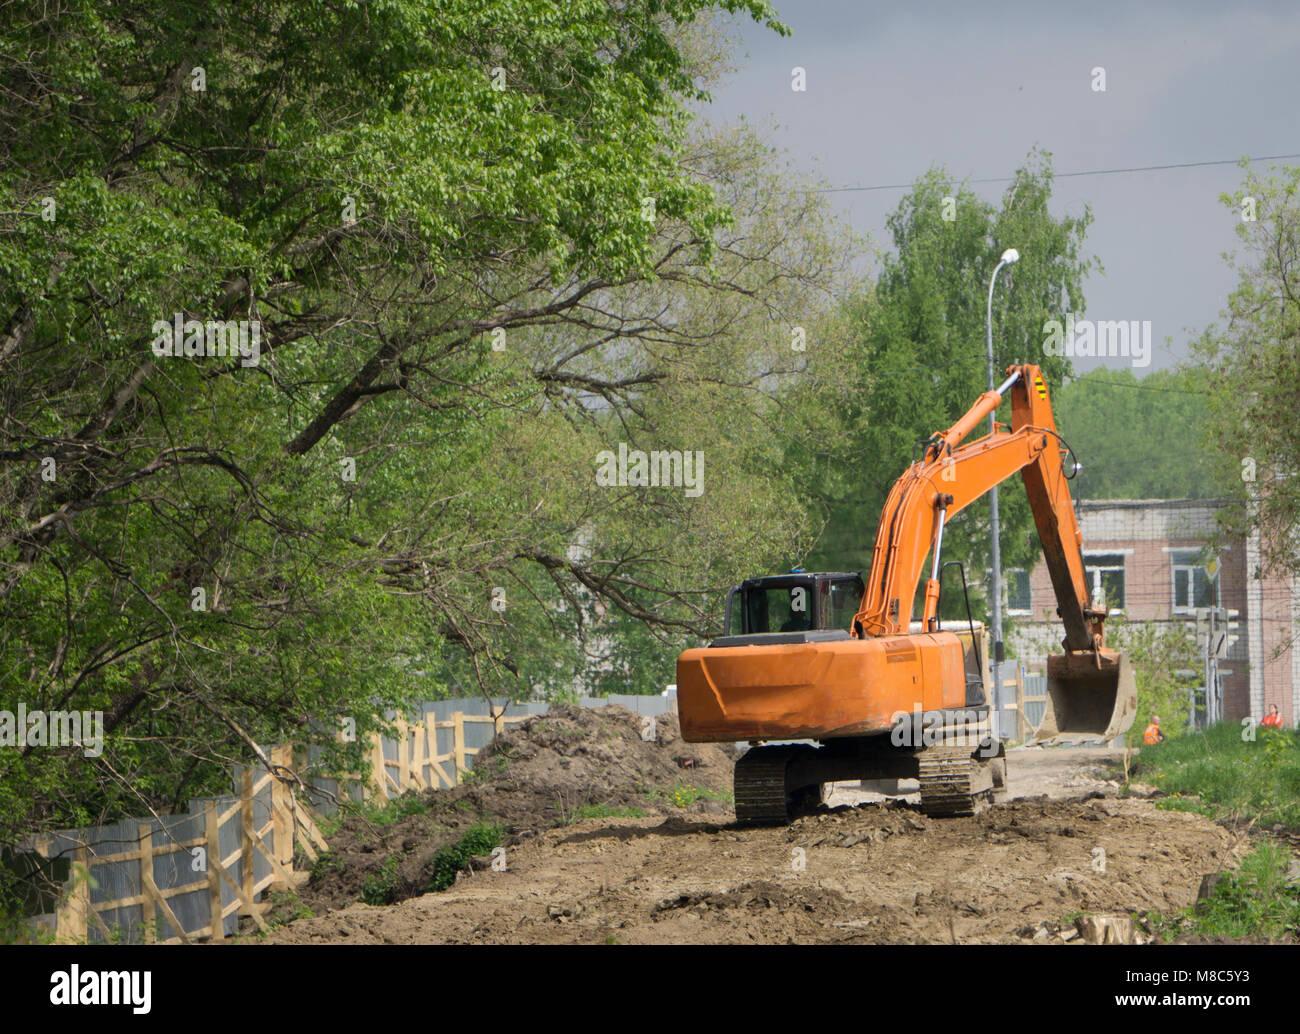 Excavators digging the ground - Stock Image